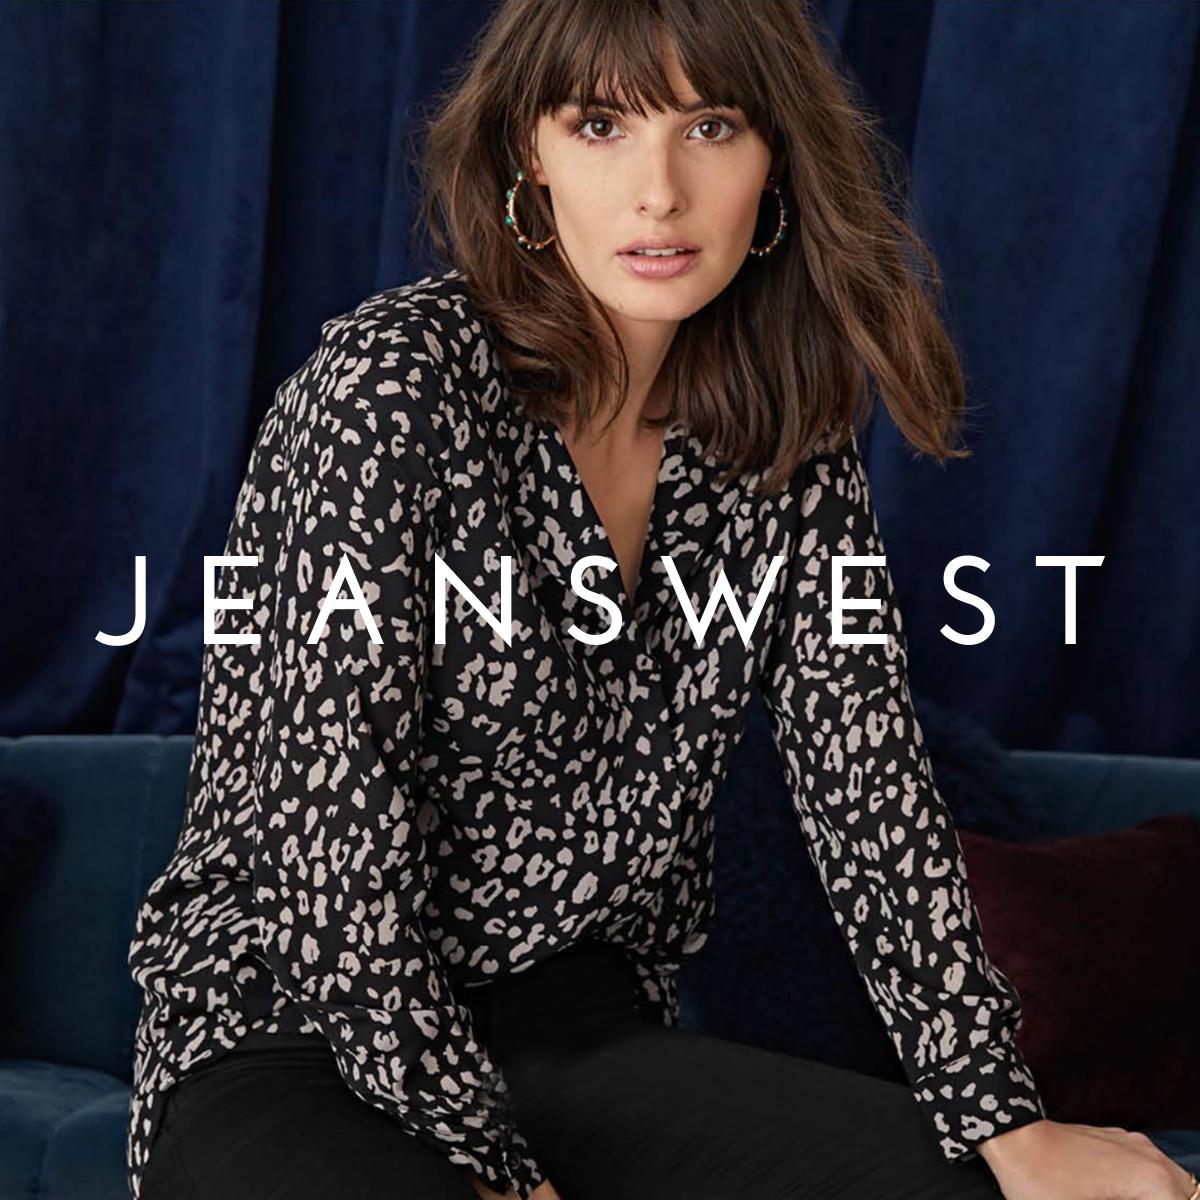 Jeanswest New Season Launch Offer